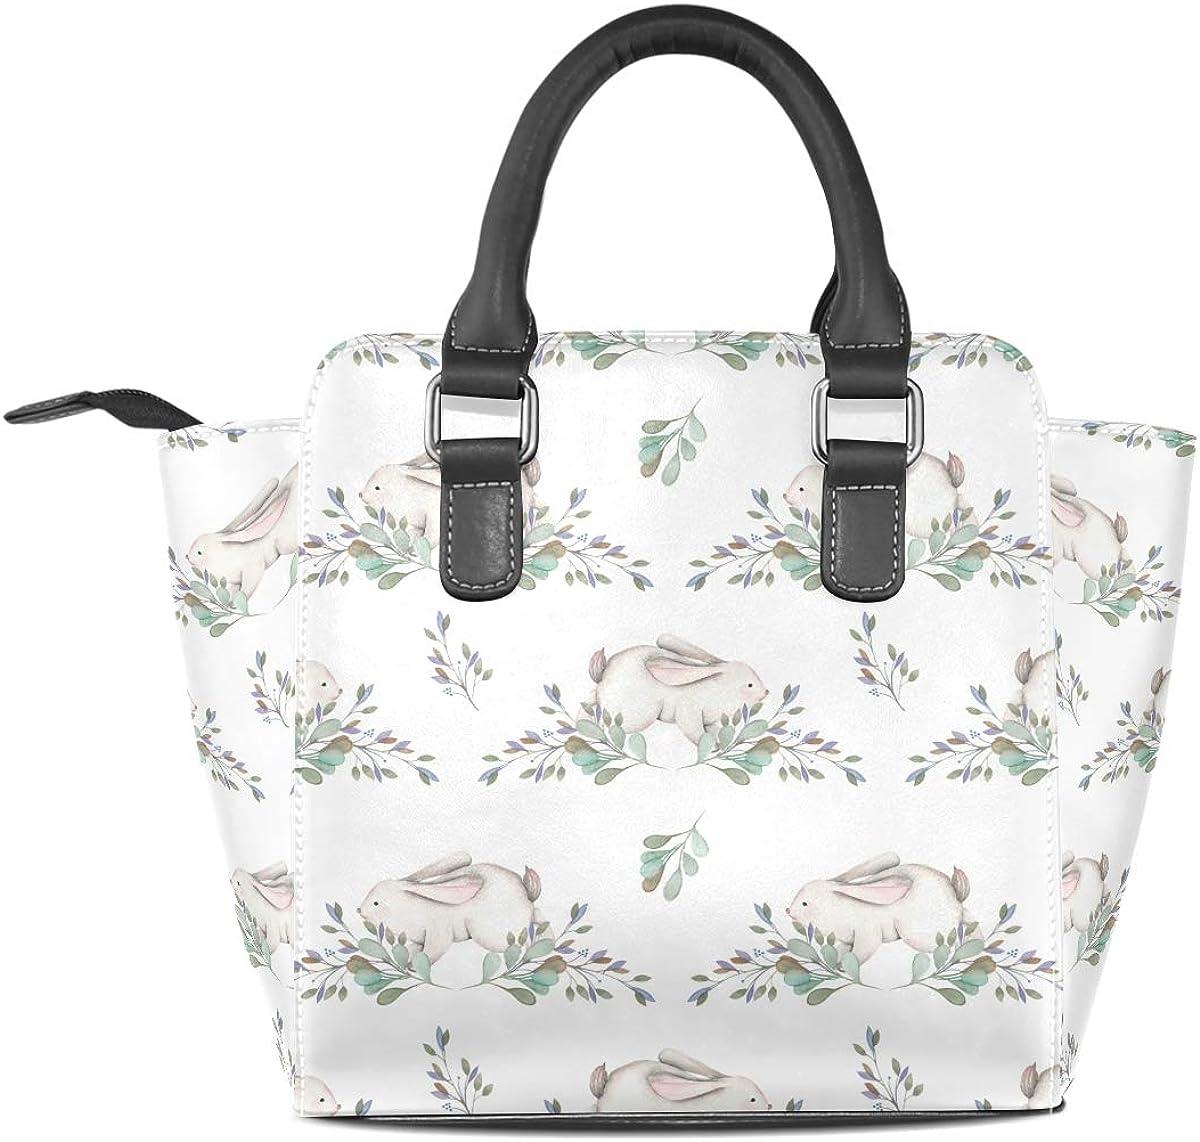 Pink Cartoon Rabbit Leather Handbags Purses Shoulder Tote Satchel Bags Womens